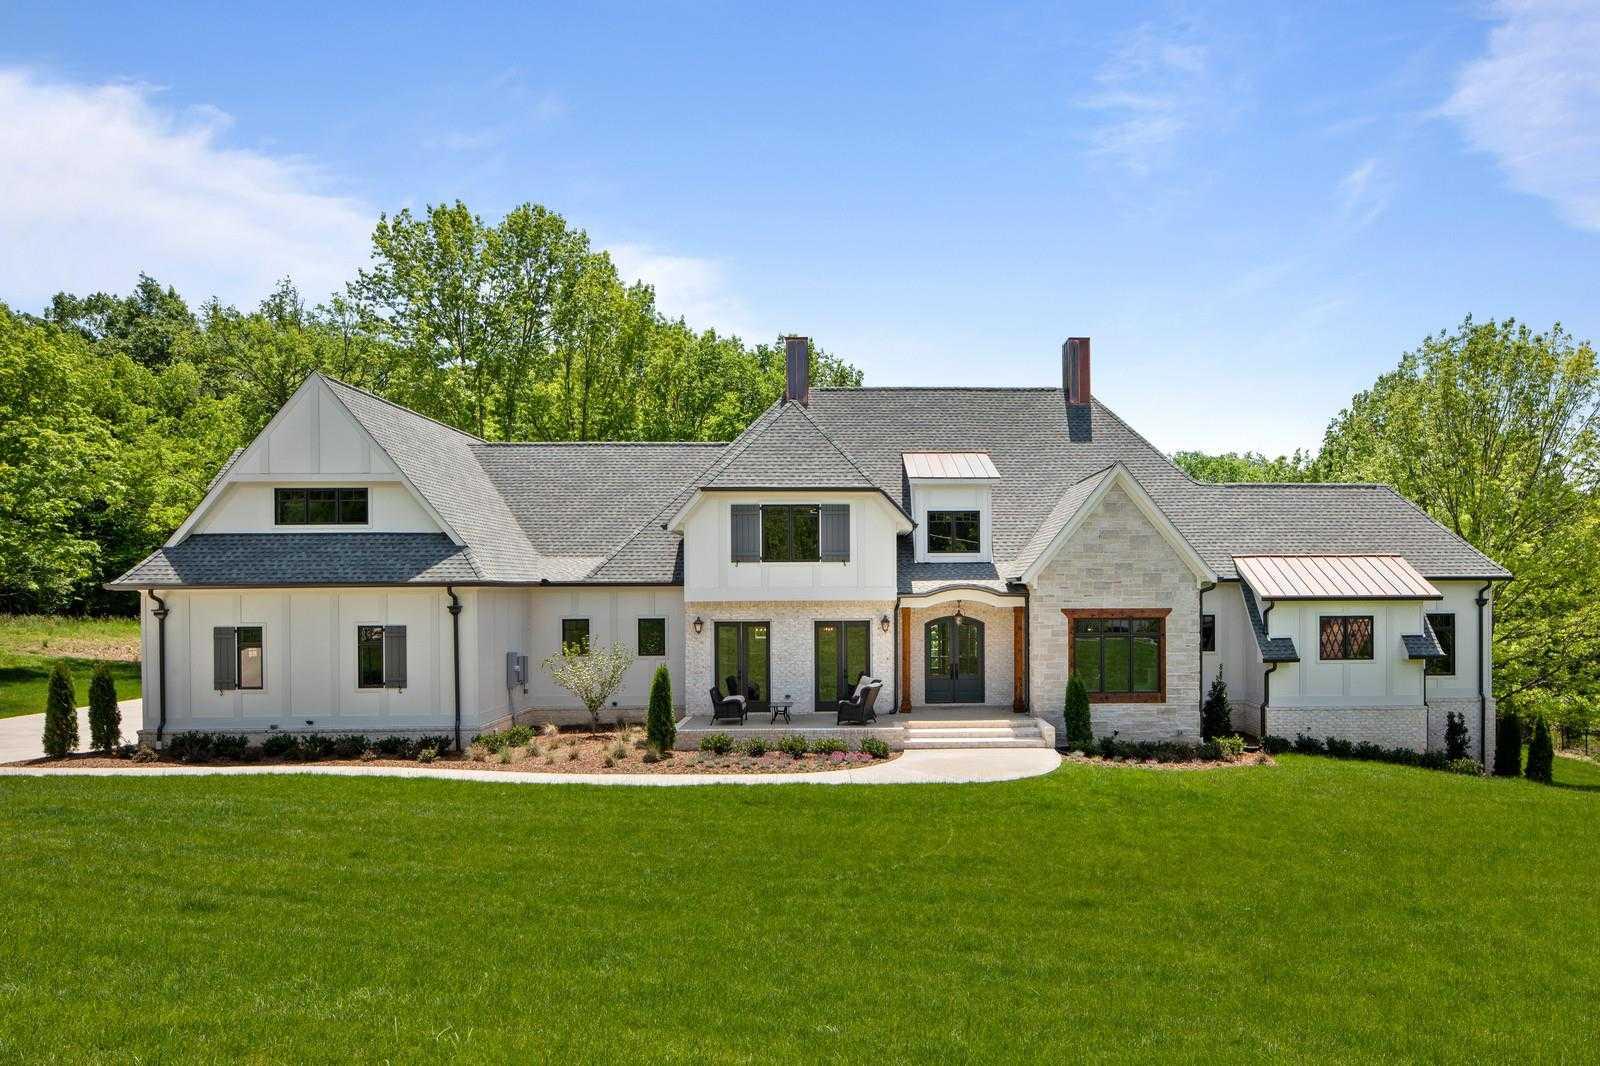 $2,799,980 - 5Br/5Ba -  for Sale in The Reserve At Radnor Lake, Nashville